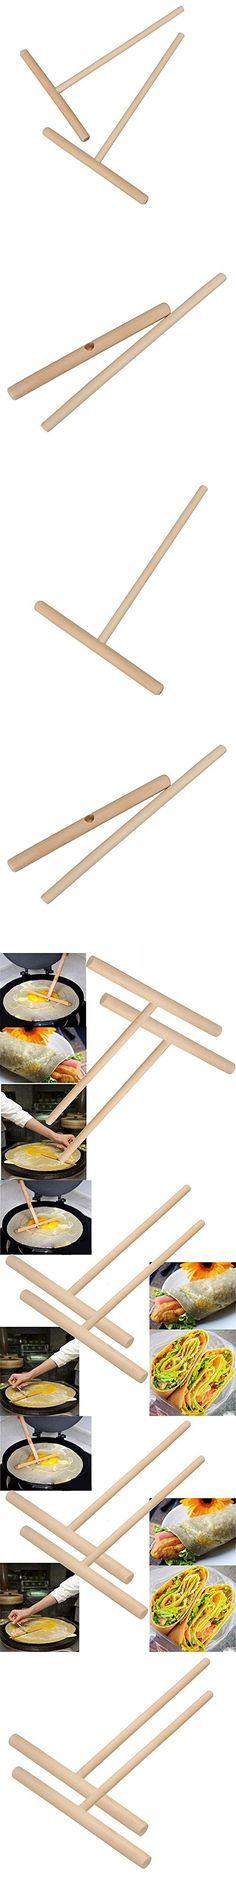 Pancake Batter Spreader T-Shaped Wooden Crepe Maker Kitchen Utensil Tools 2-Pack